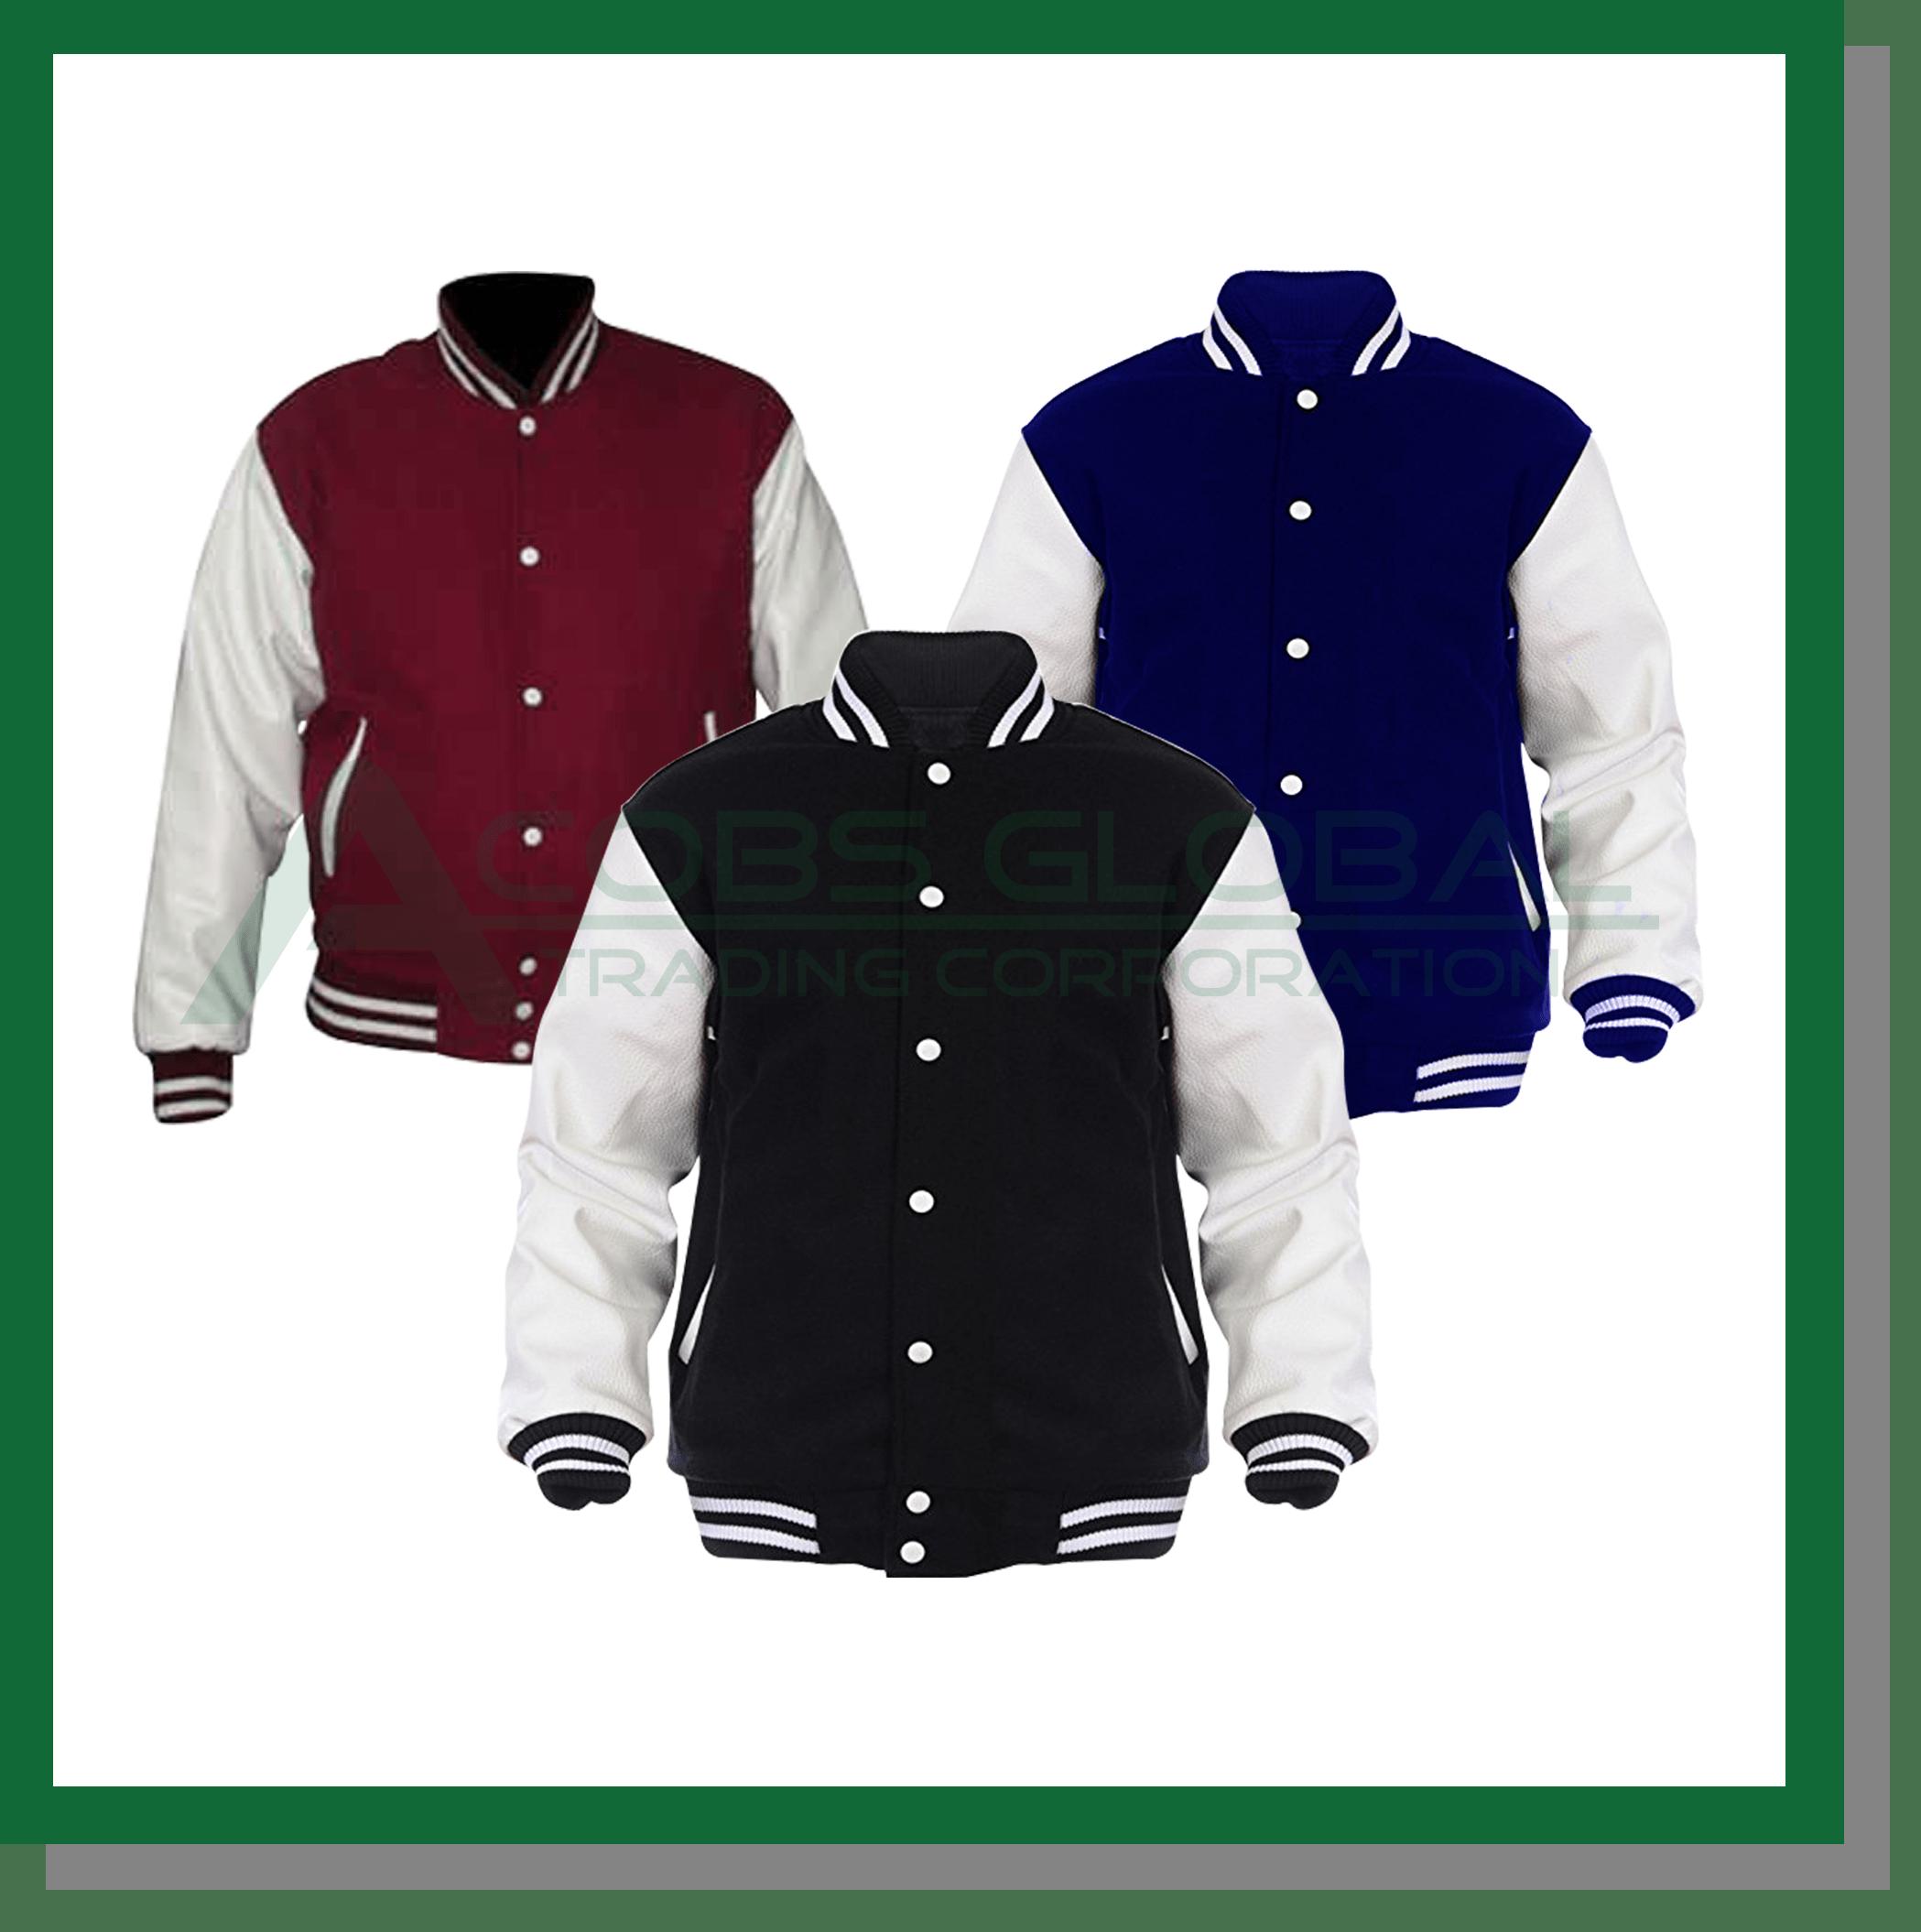 varsity jacket divisoria corporate jacket supplier